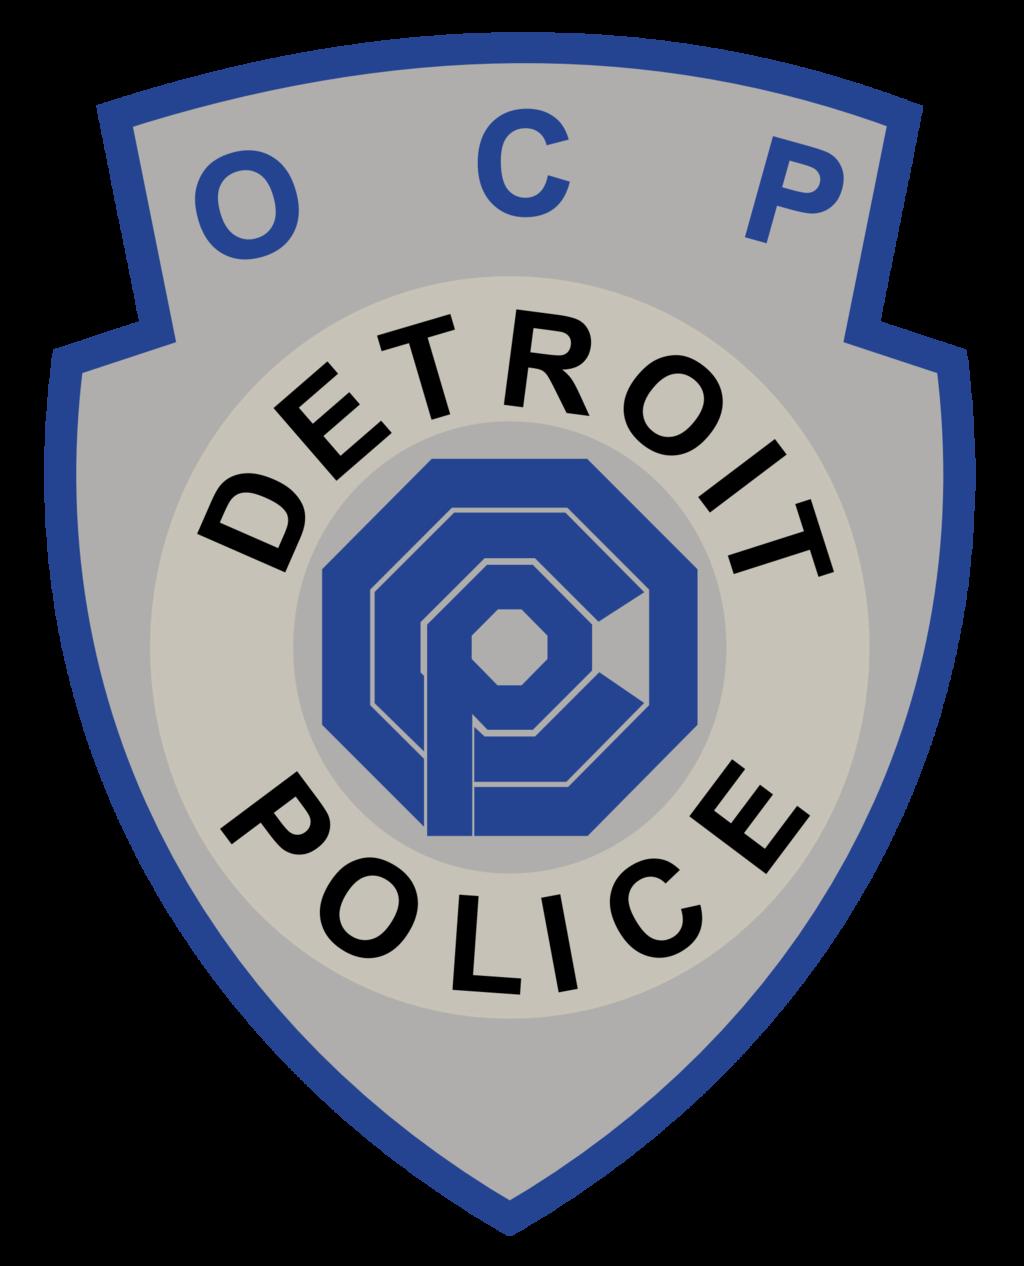 1024x1266 Ocp Detroit Police Badge Ver 2 By Pointingmonkey